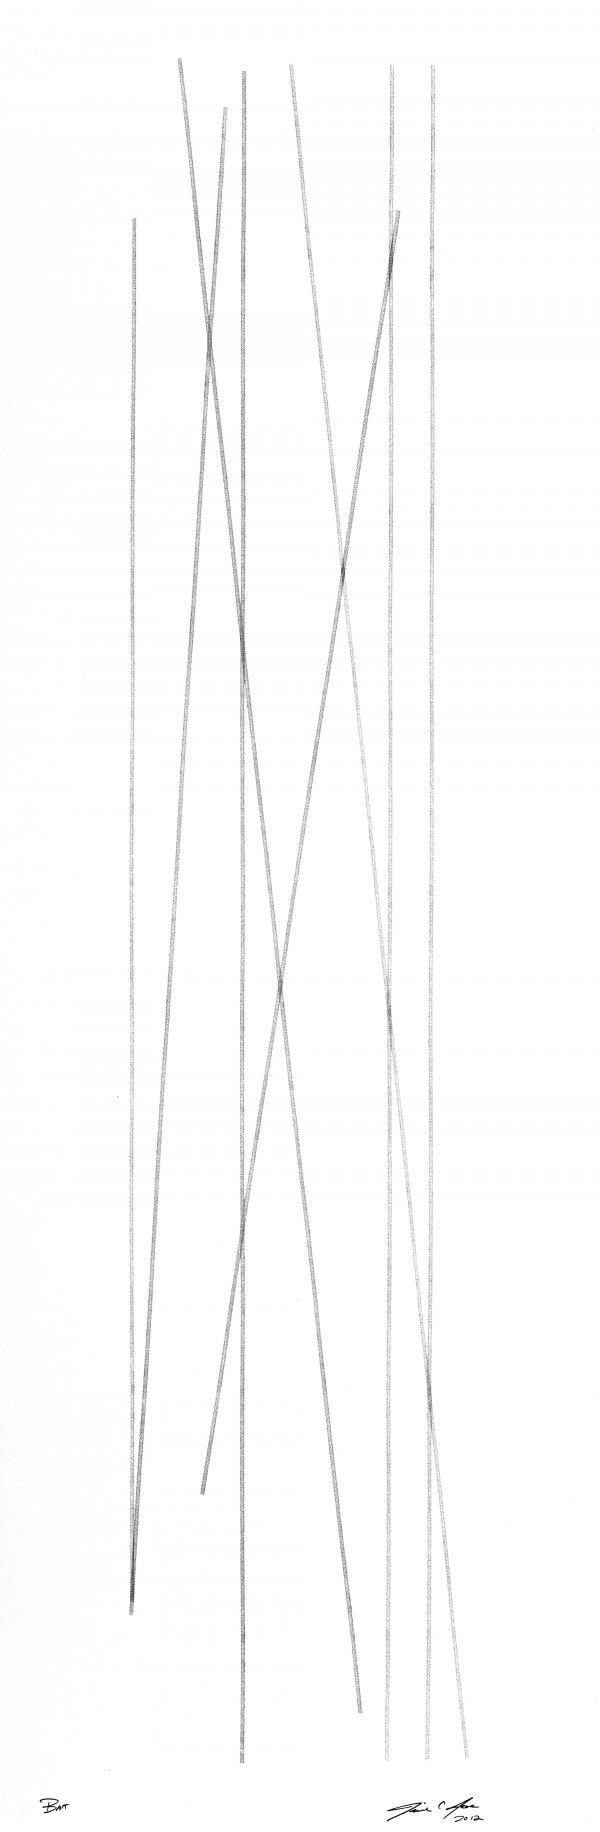 Static Reverberation / String Arrangement #1 by Jennie C. Jones